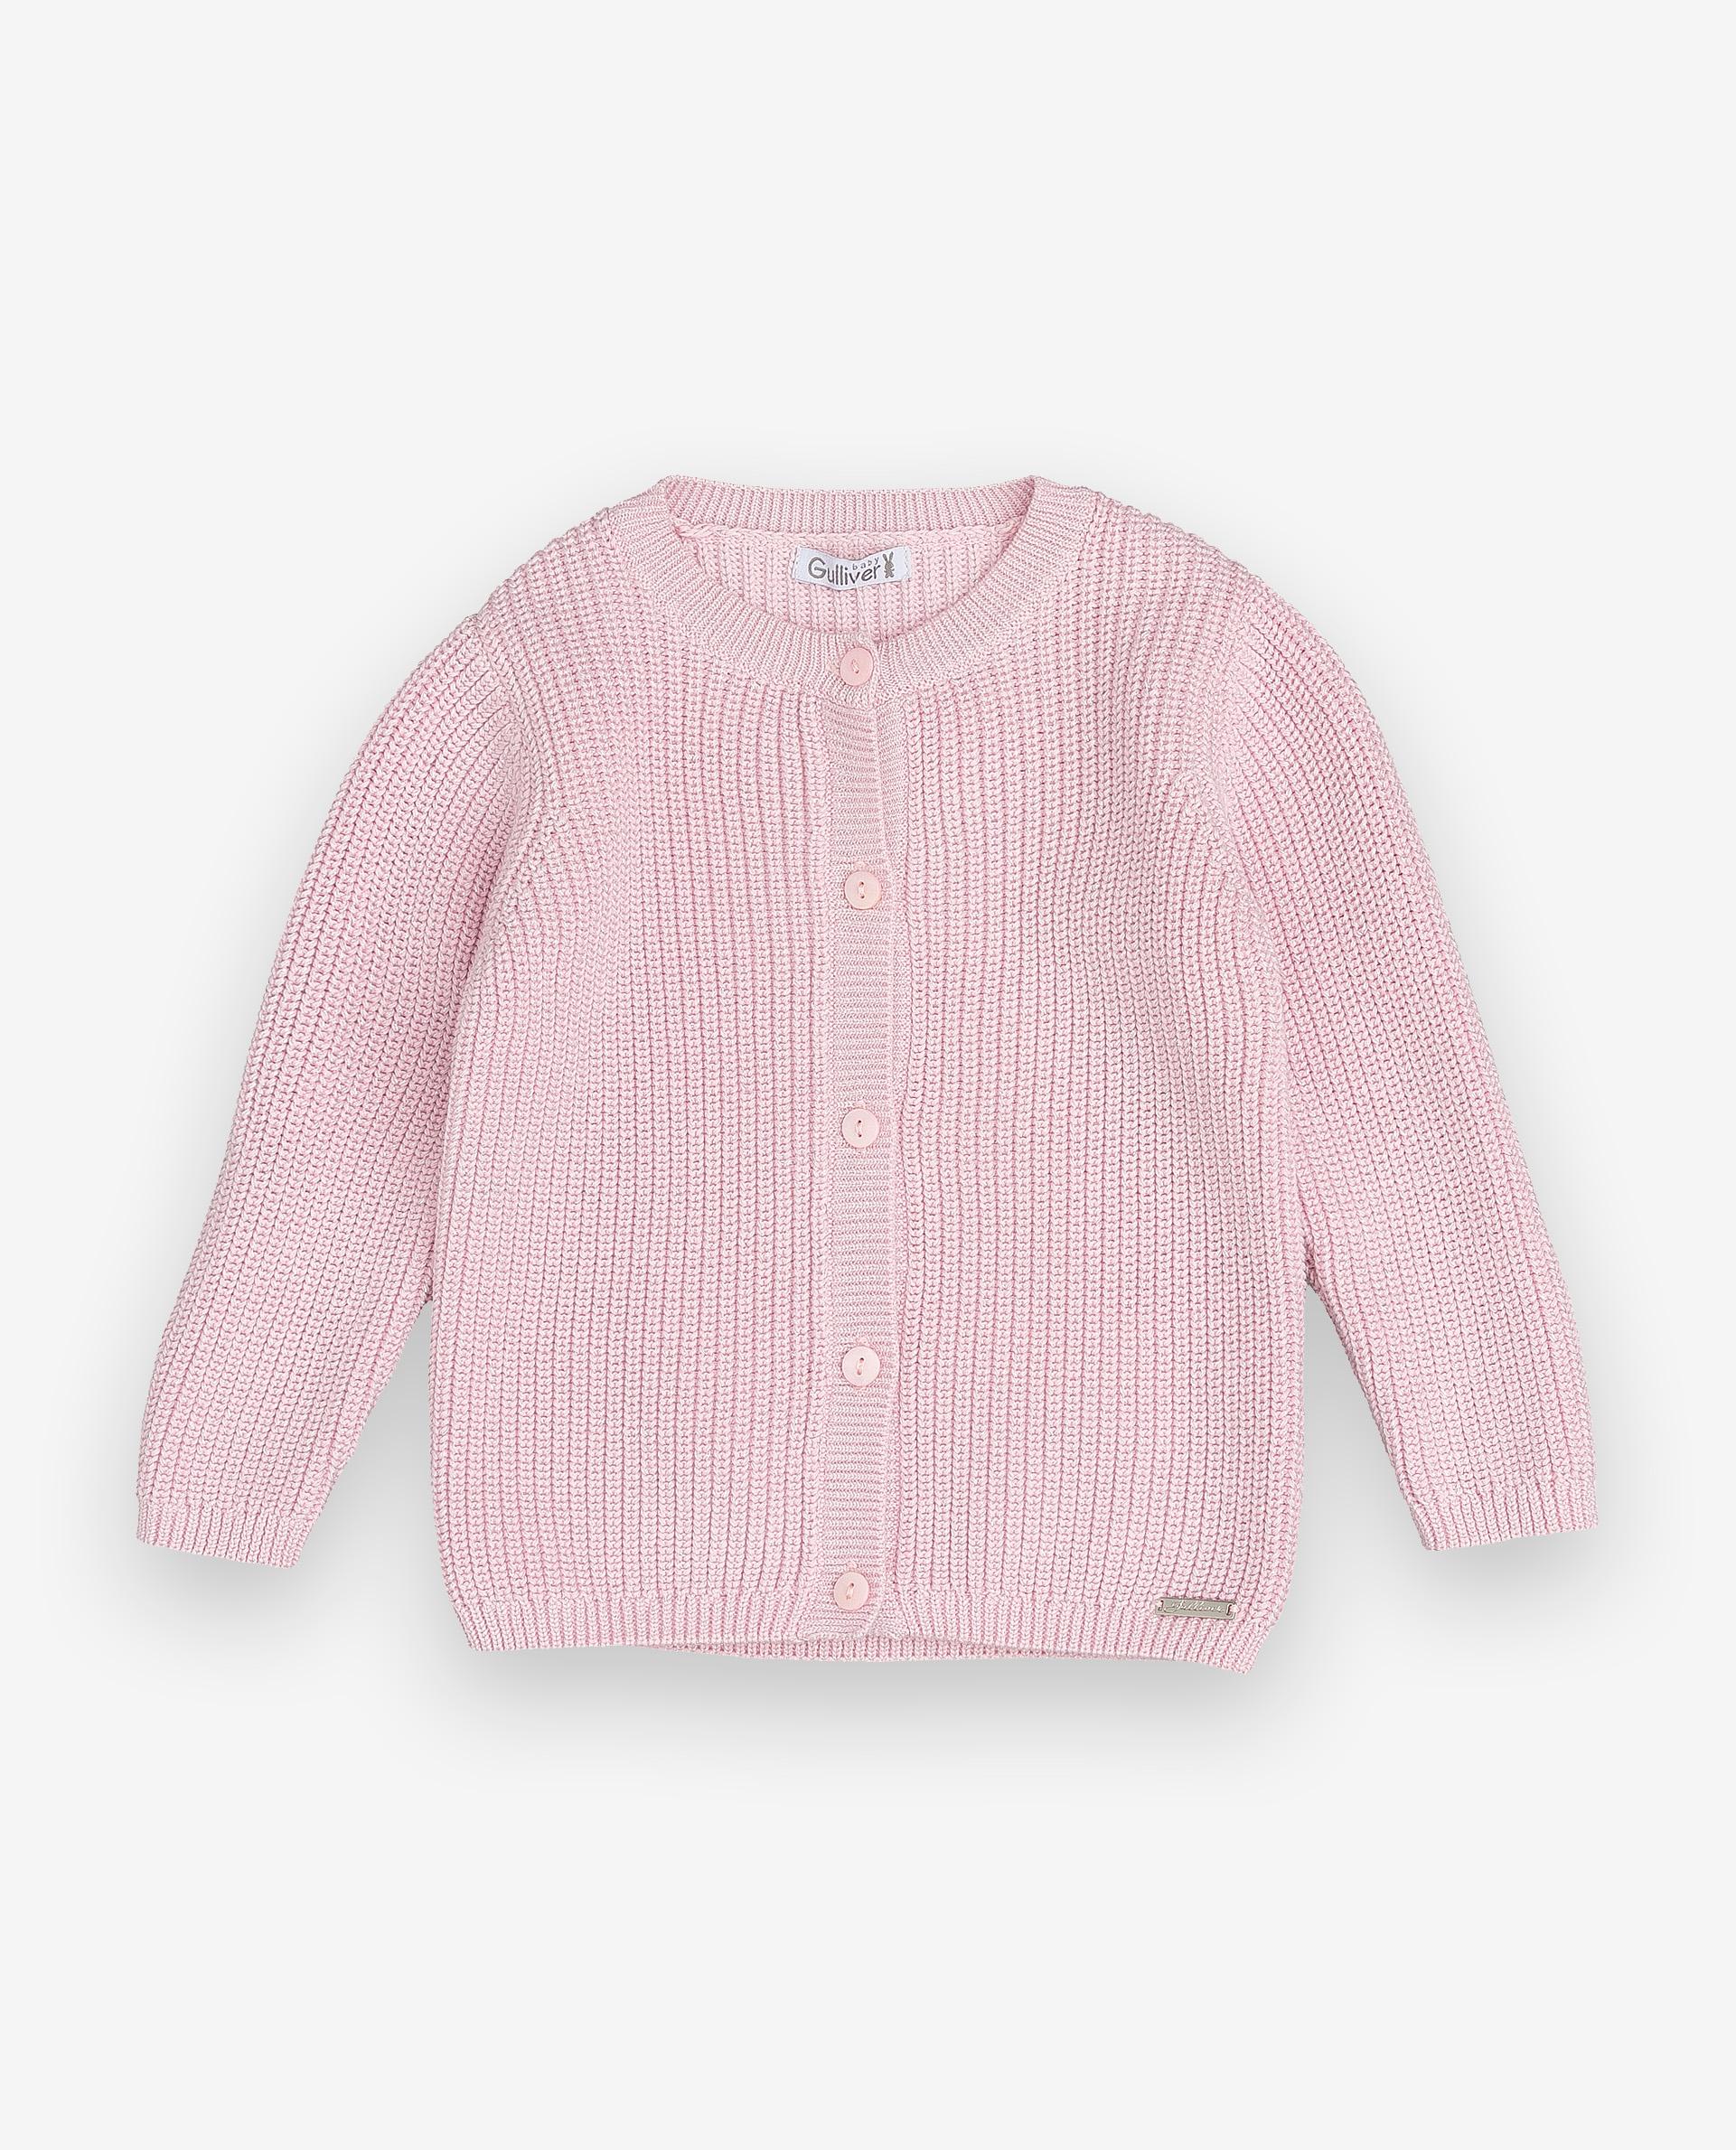 Купить 12031GBC3501, Розовый кардиган Gulliver, Gulliver Baby, розовый, 86, Женский, ОСЕНЬ/ЗИМА 2020-2021 (shop: GulliverMarket Gulliver Market)